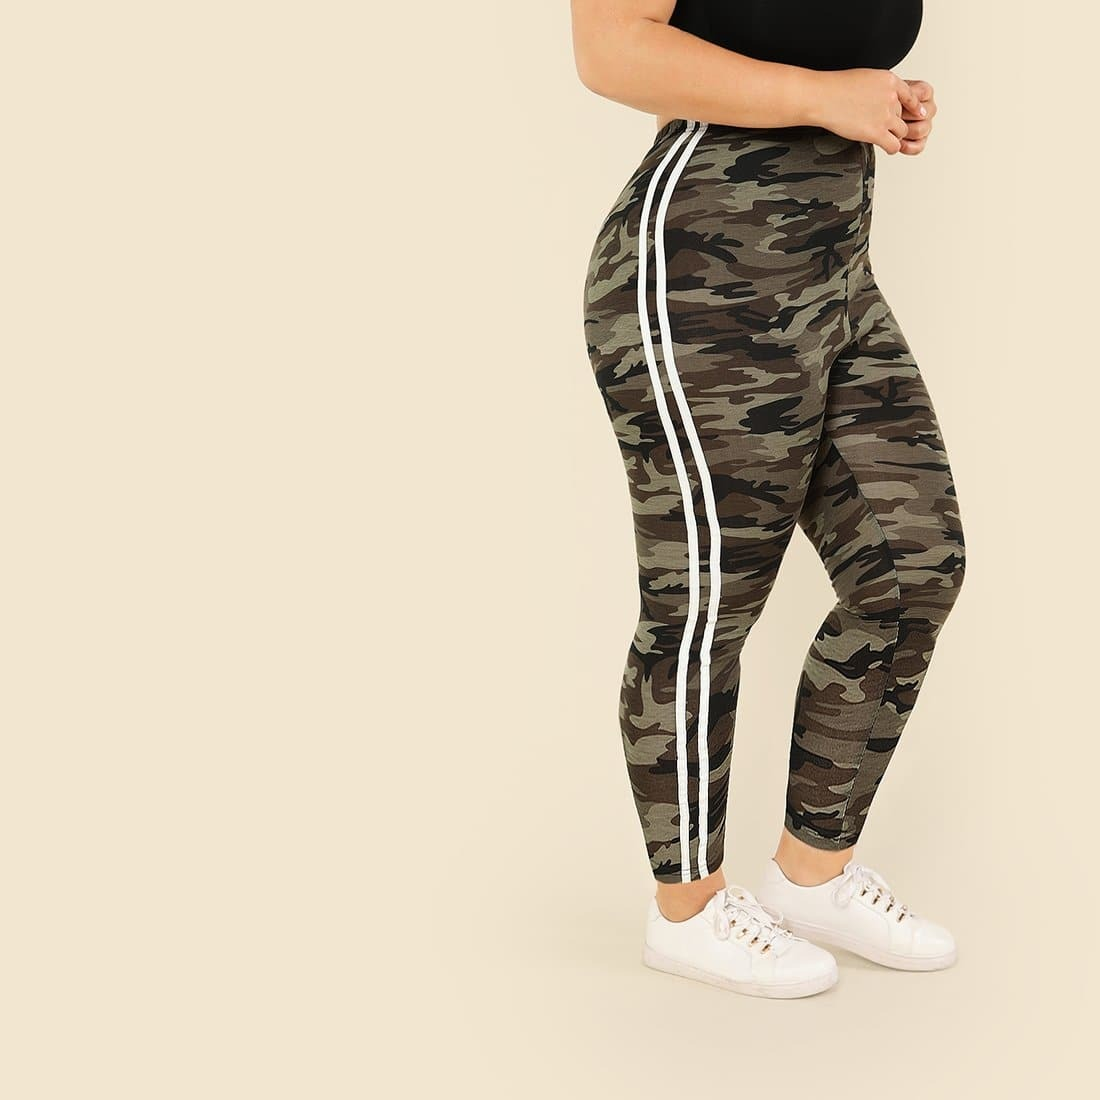 Plus Camouflage print leggings met contrasterende zijstreep